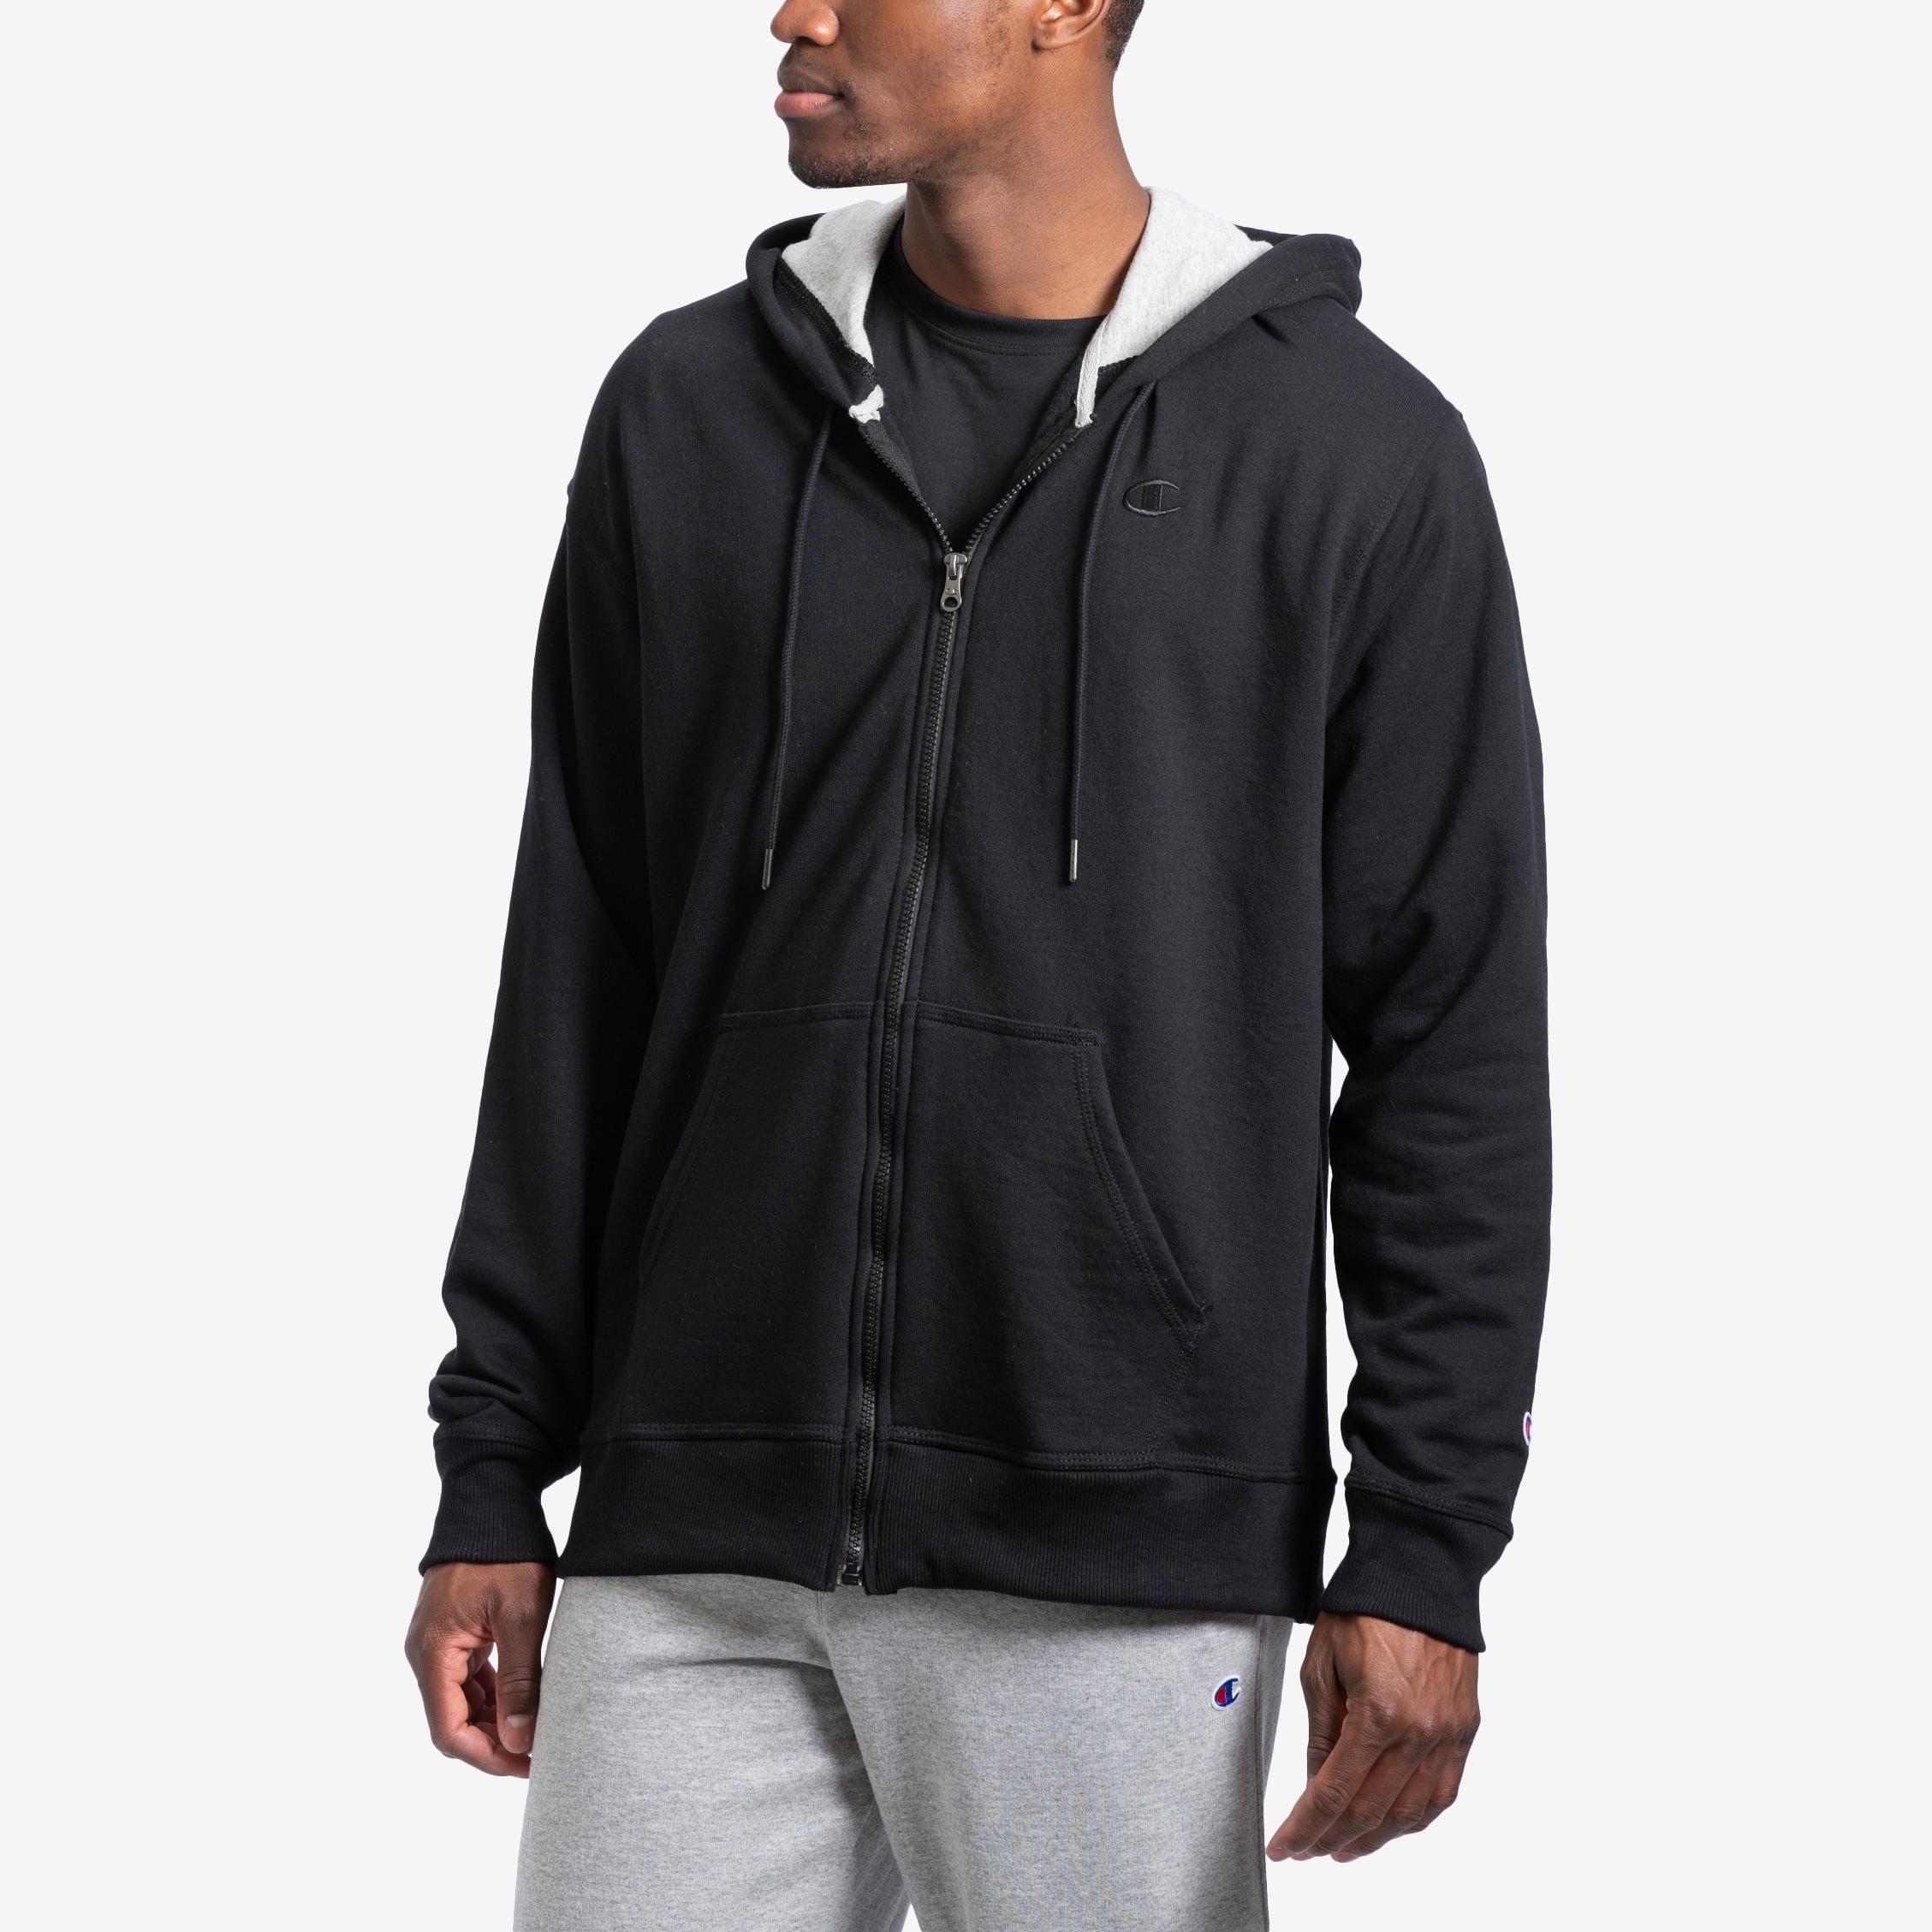 Powerblend Sweats Full Zip Jacket